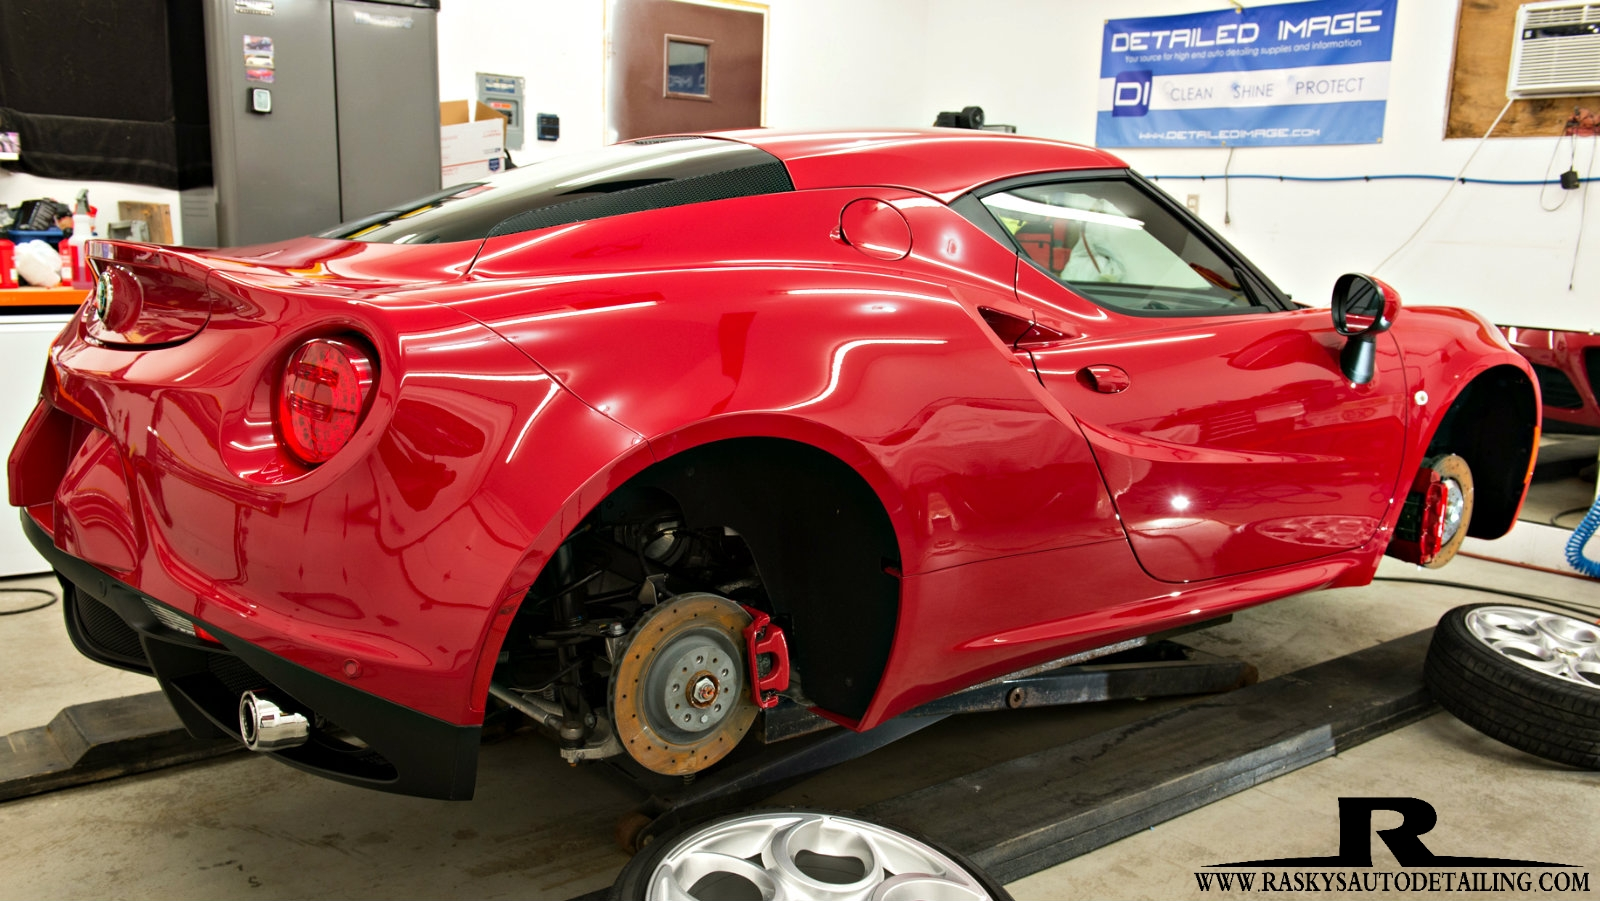 This Alfa Romeo 4C had the whole wheels off correction and ceramic nano coating treatment by Chad Raskovich in MInneapolis